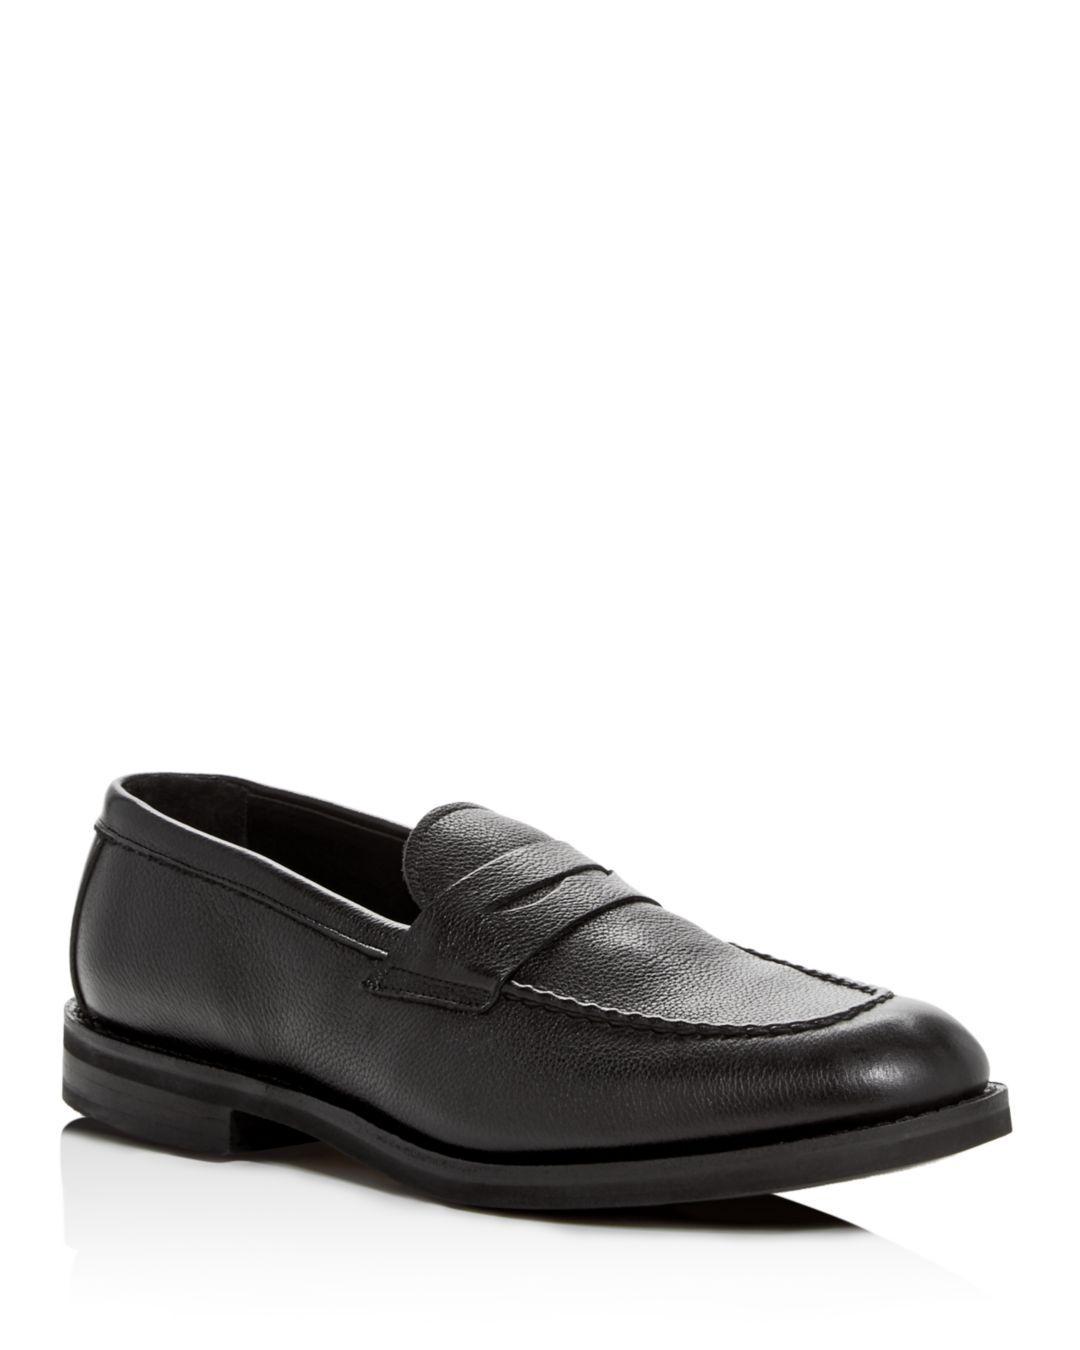 ffd3566de83 Lyst - Allen Edmonds Men s Nomad Leather Penny Loafers in Black for Men